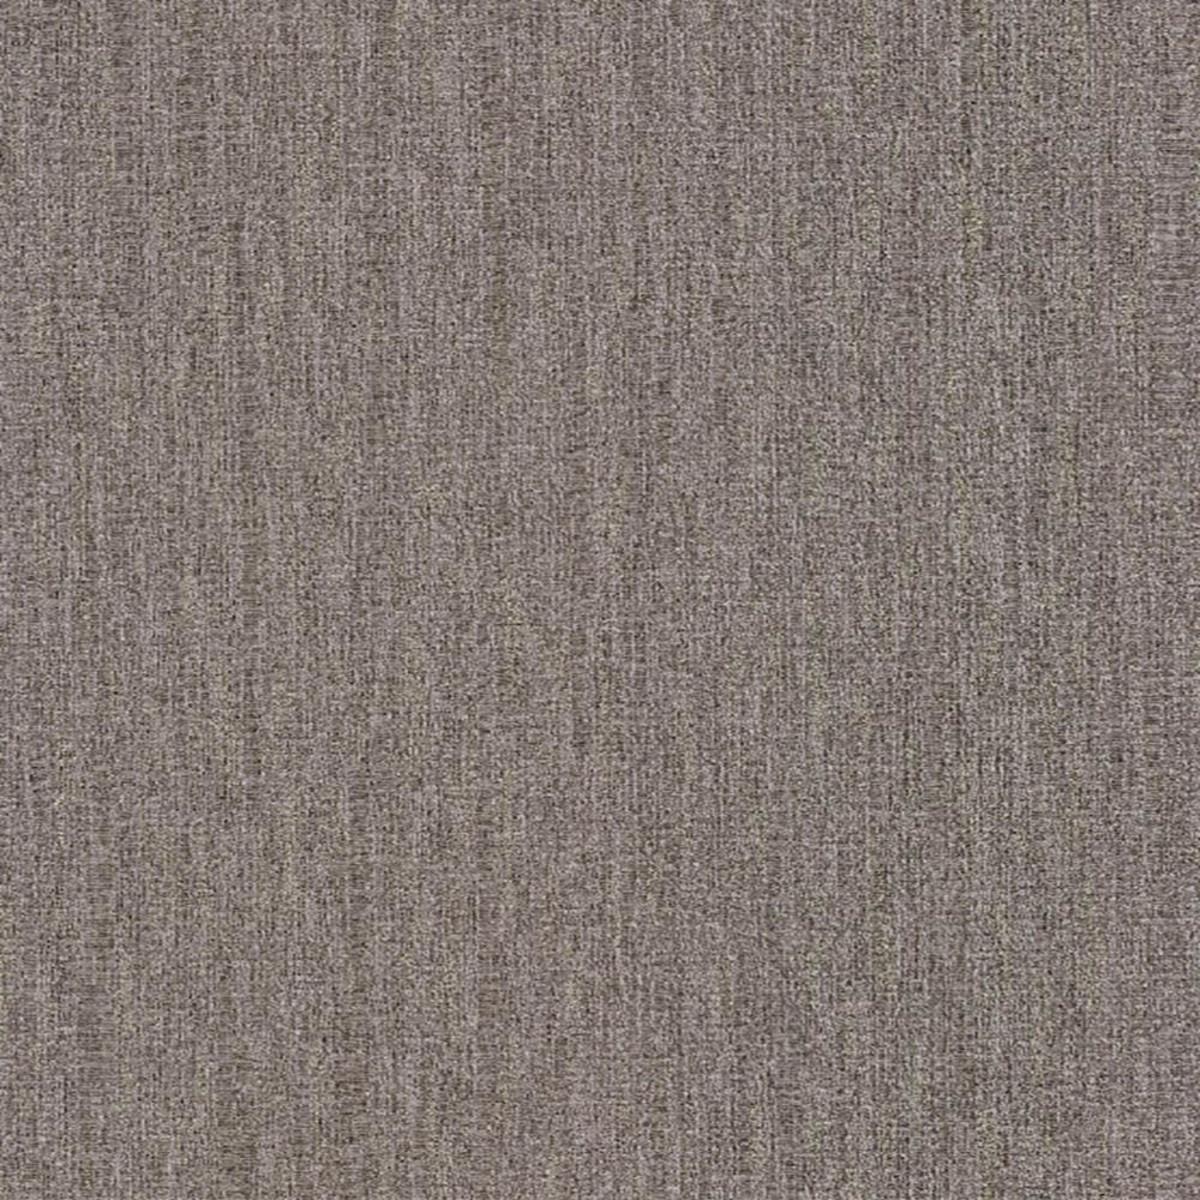 Обои флизелиновые Zambaiti Fabiano коричневые 1.06 м 51133